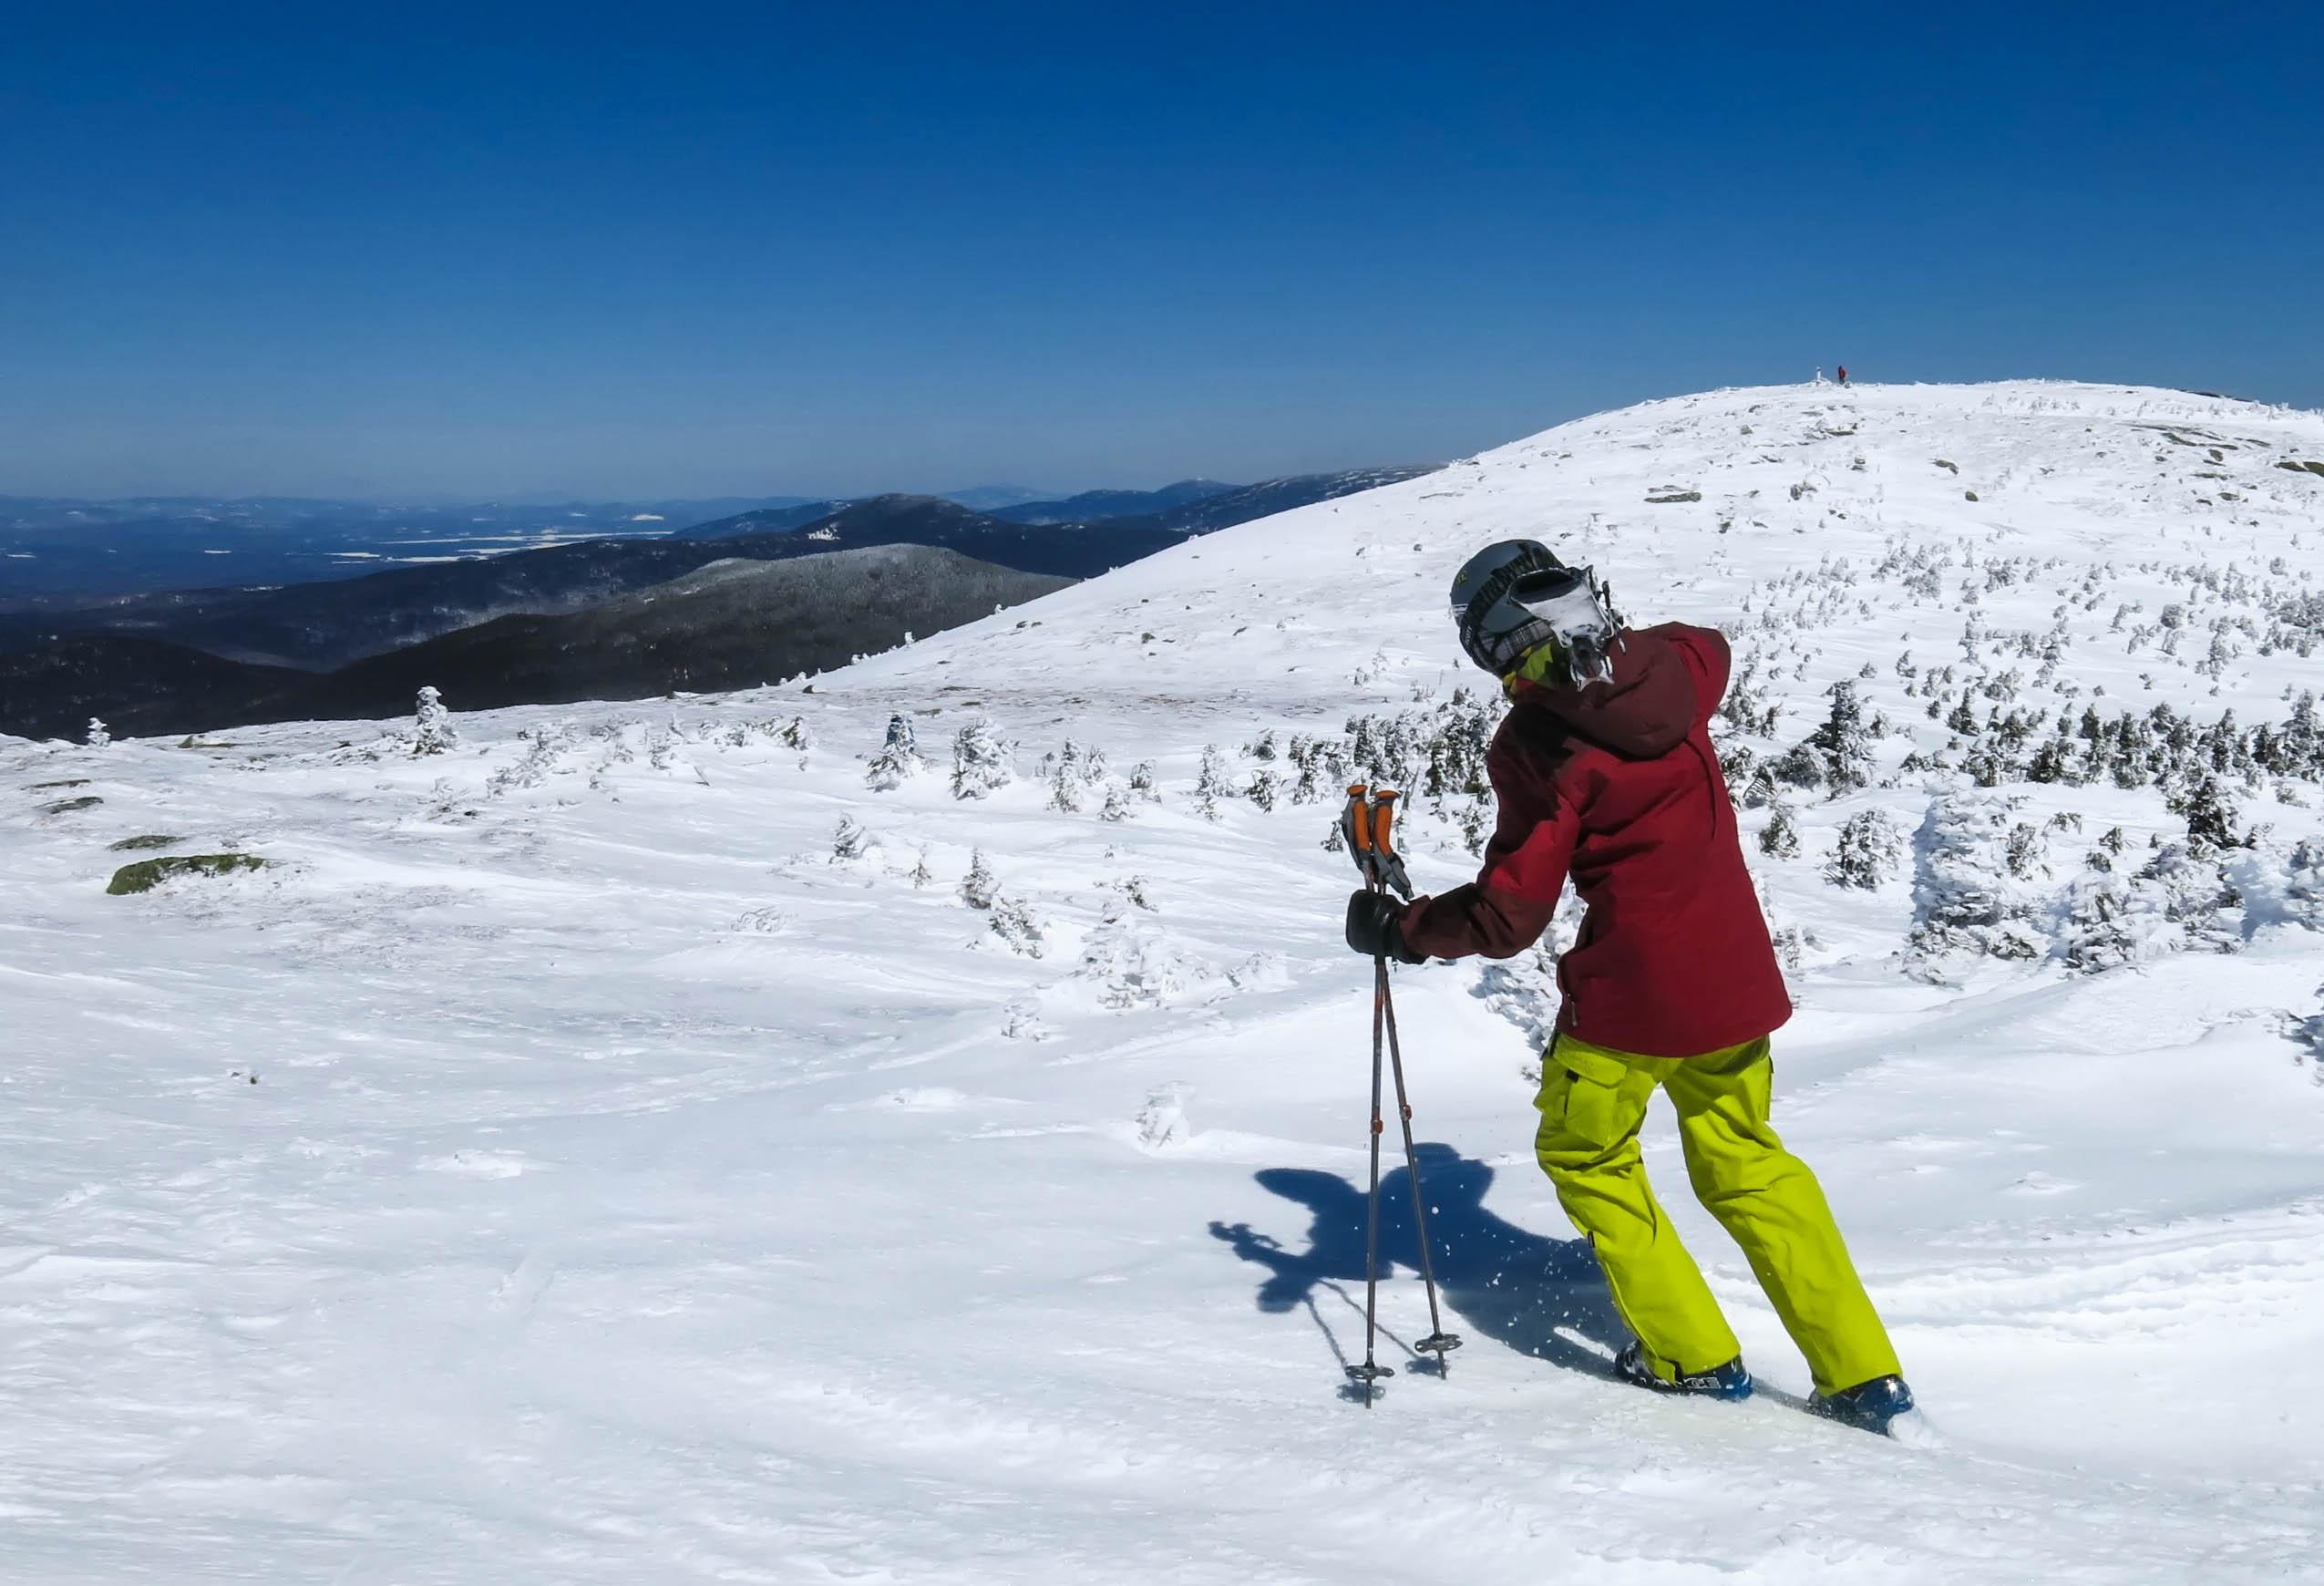 File:Skiier on saddleback.jpg - Wikimedia Commons